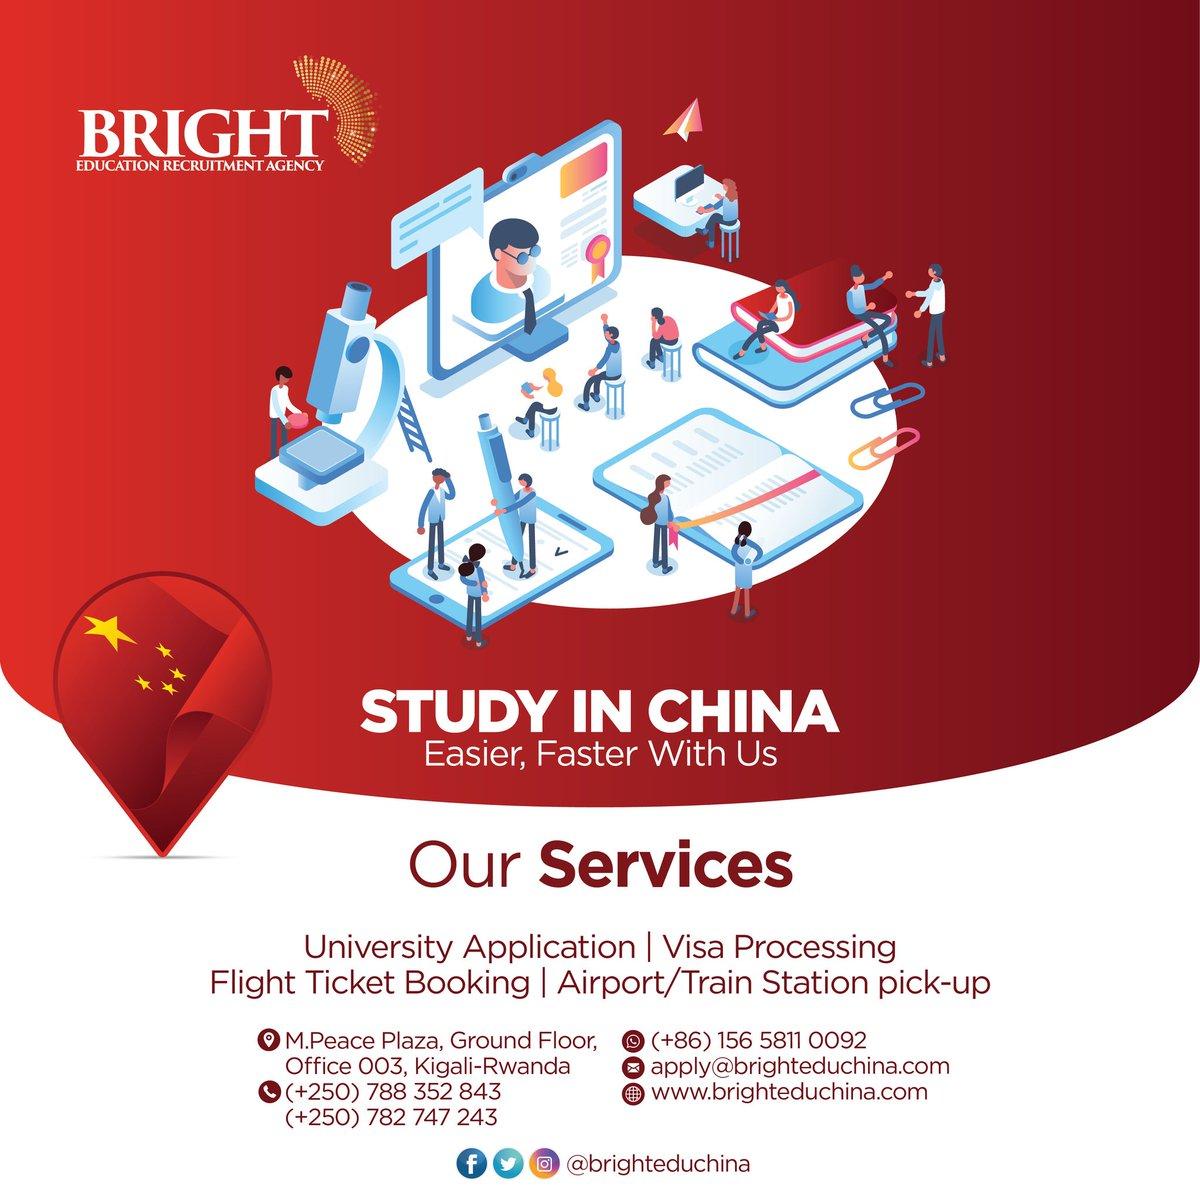 Bright Education Recruitment Agency Study in China (@brighteduchina